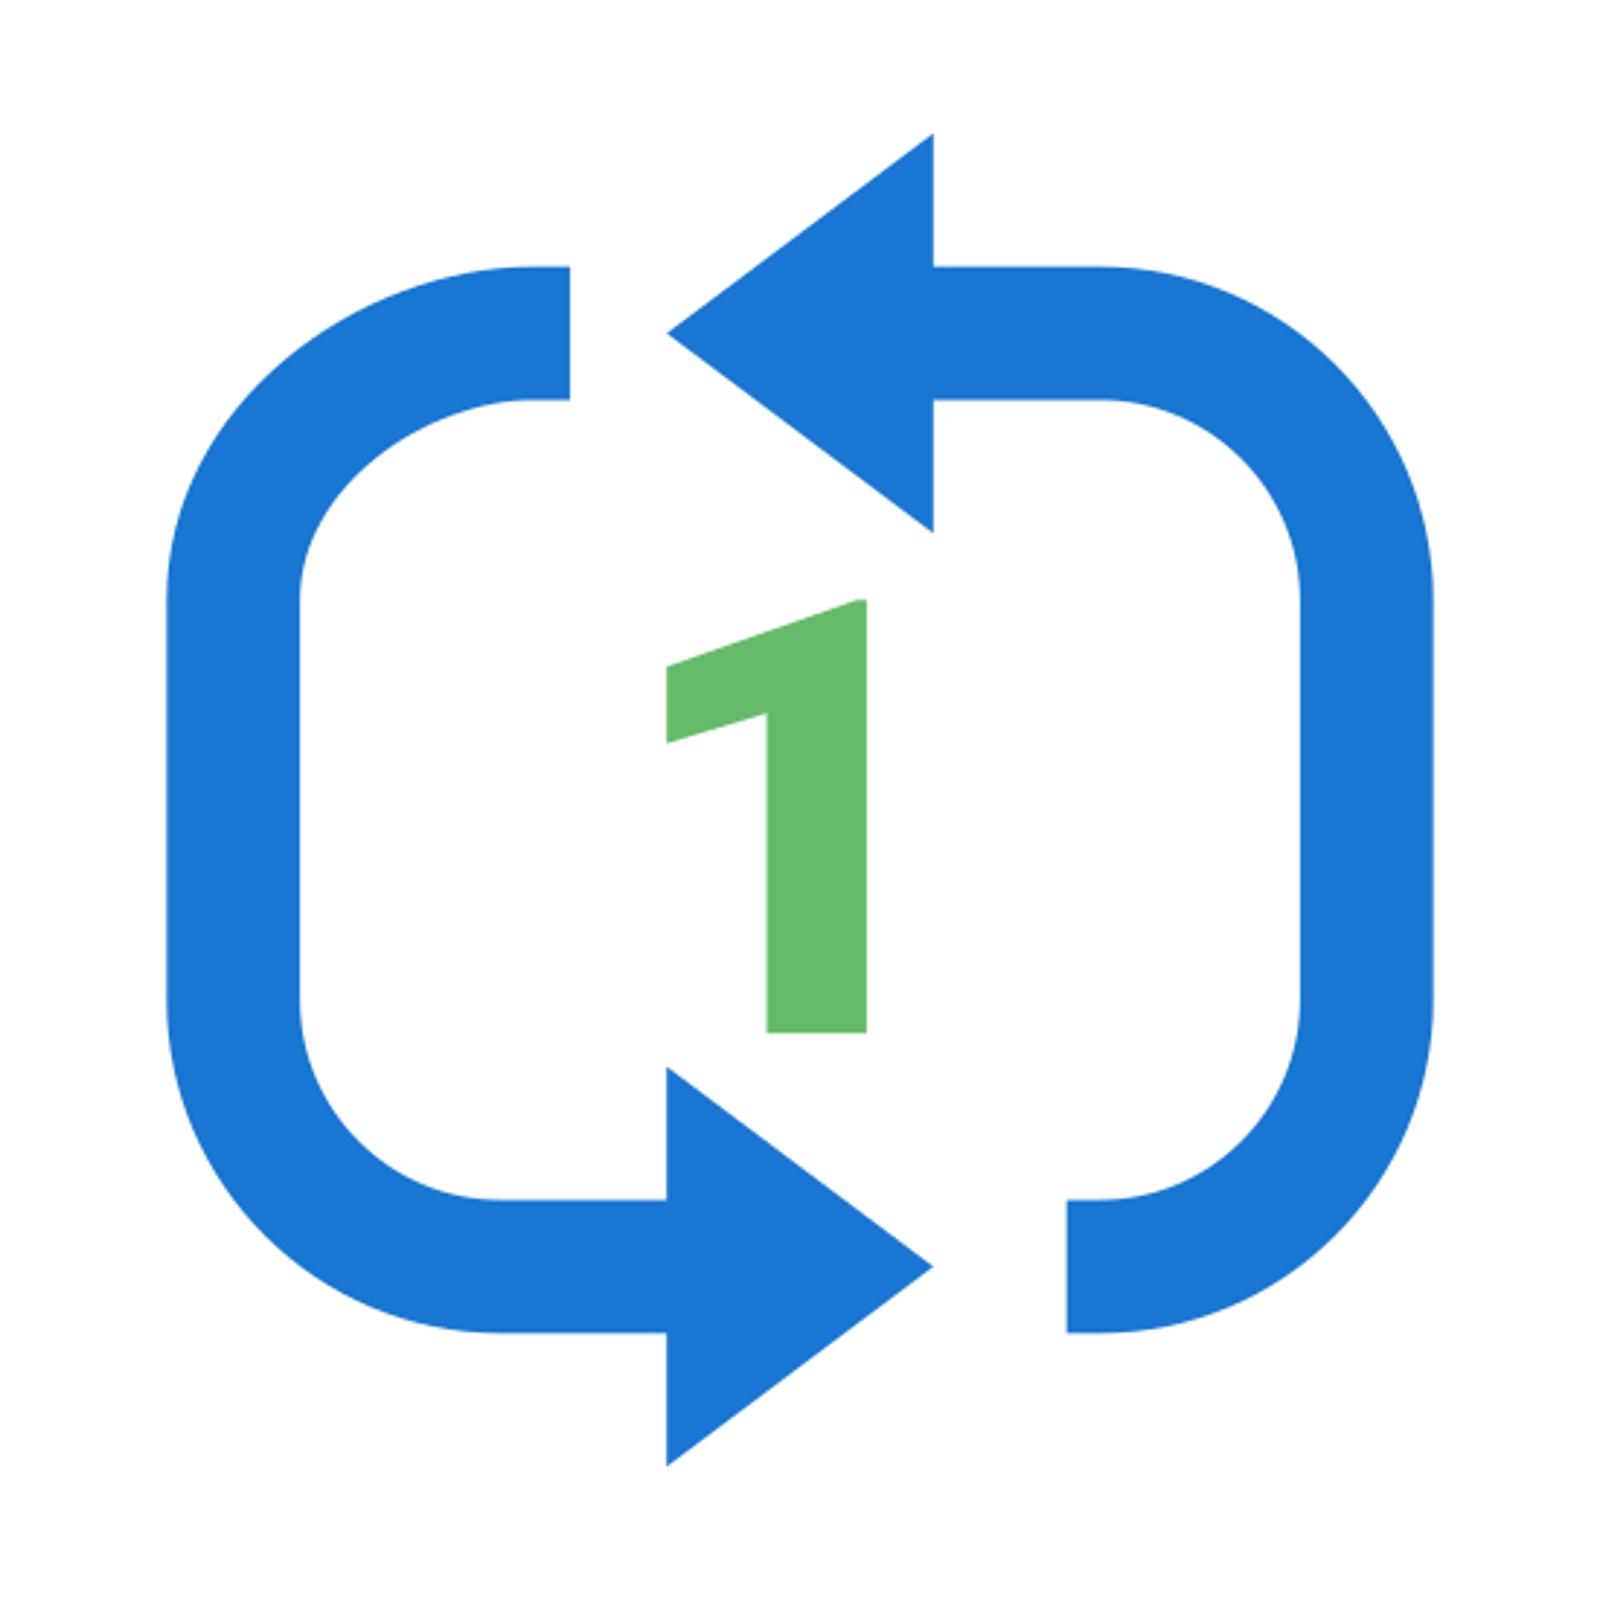 Repeat One icon